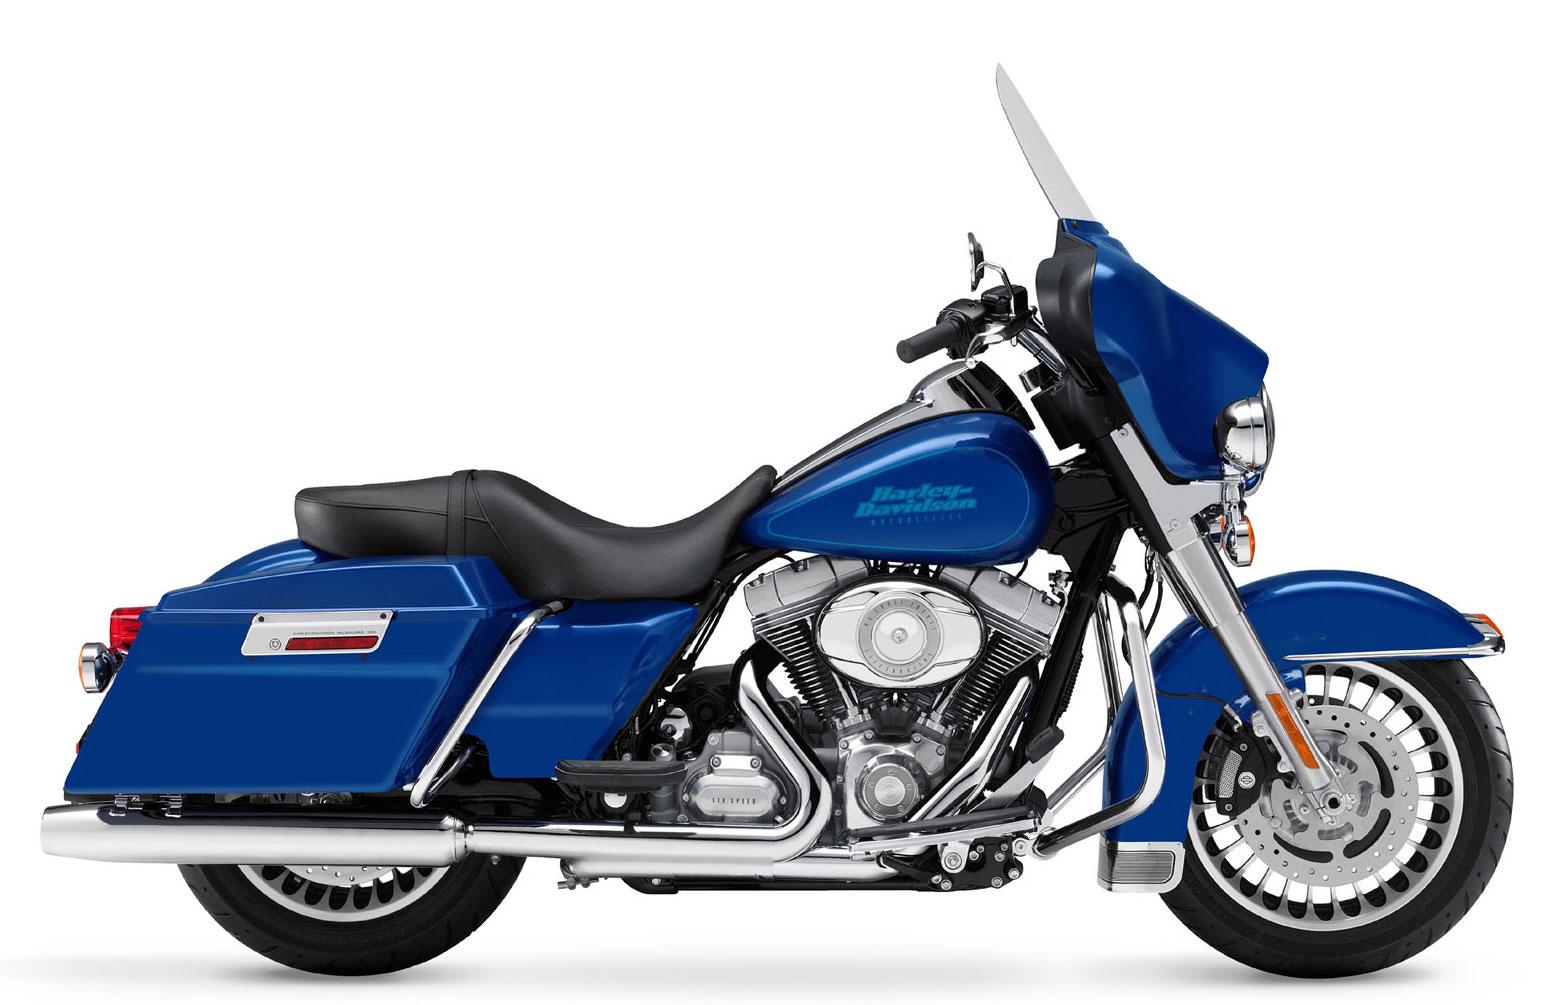 2007-2009 Harley FLHT Electra Glide Repair Manual on